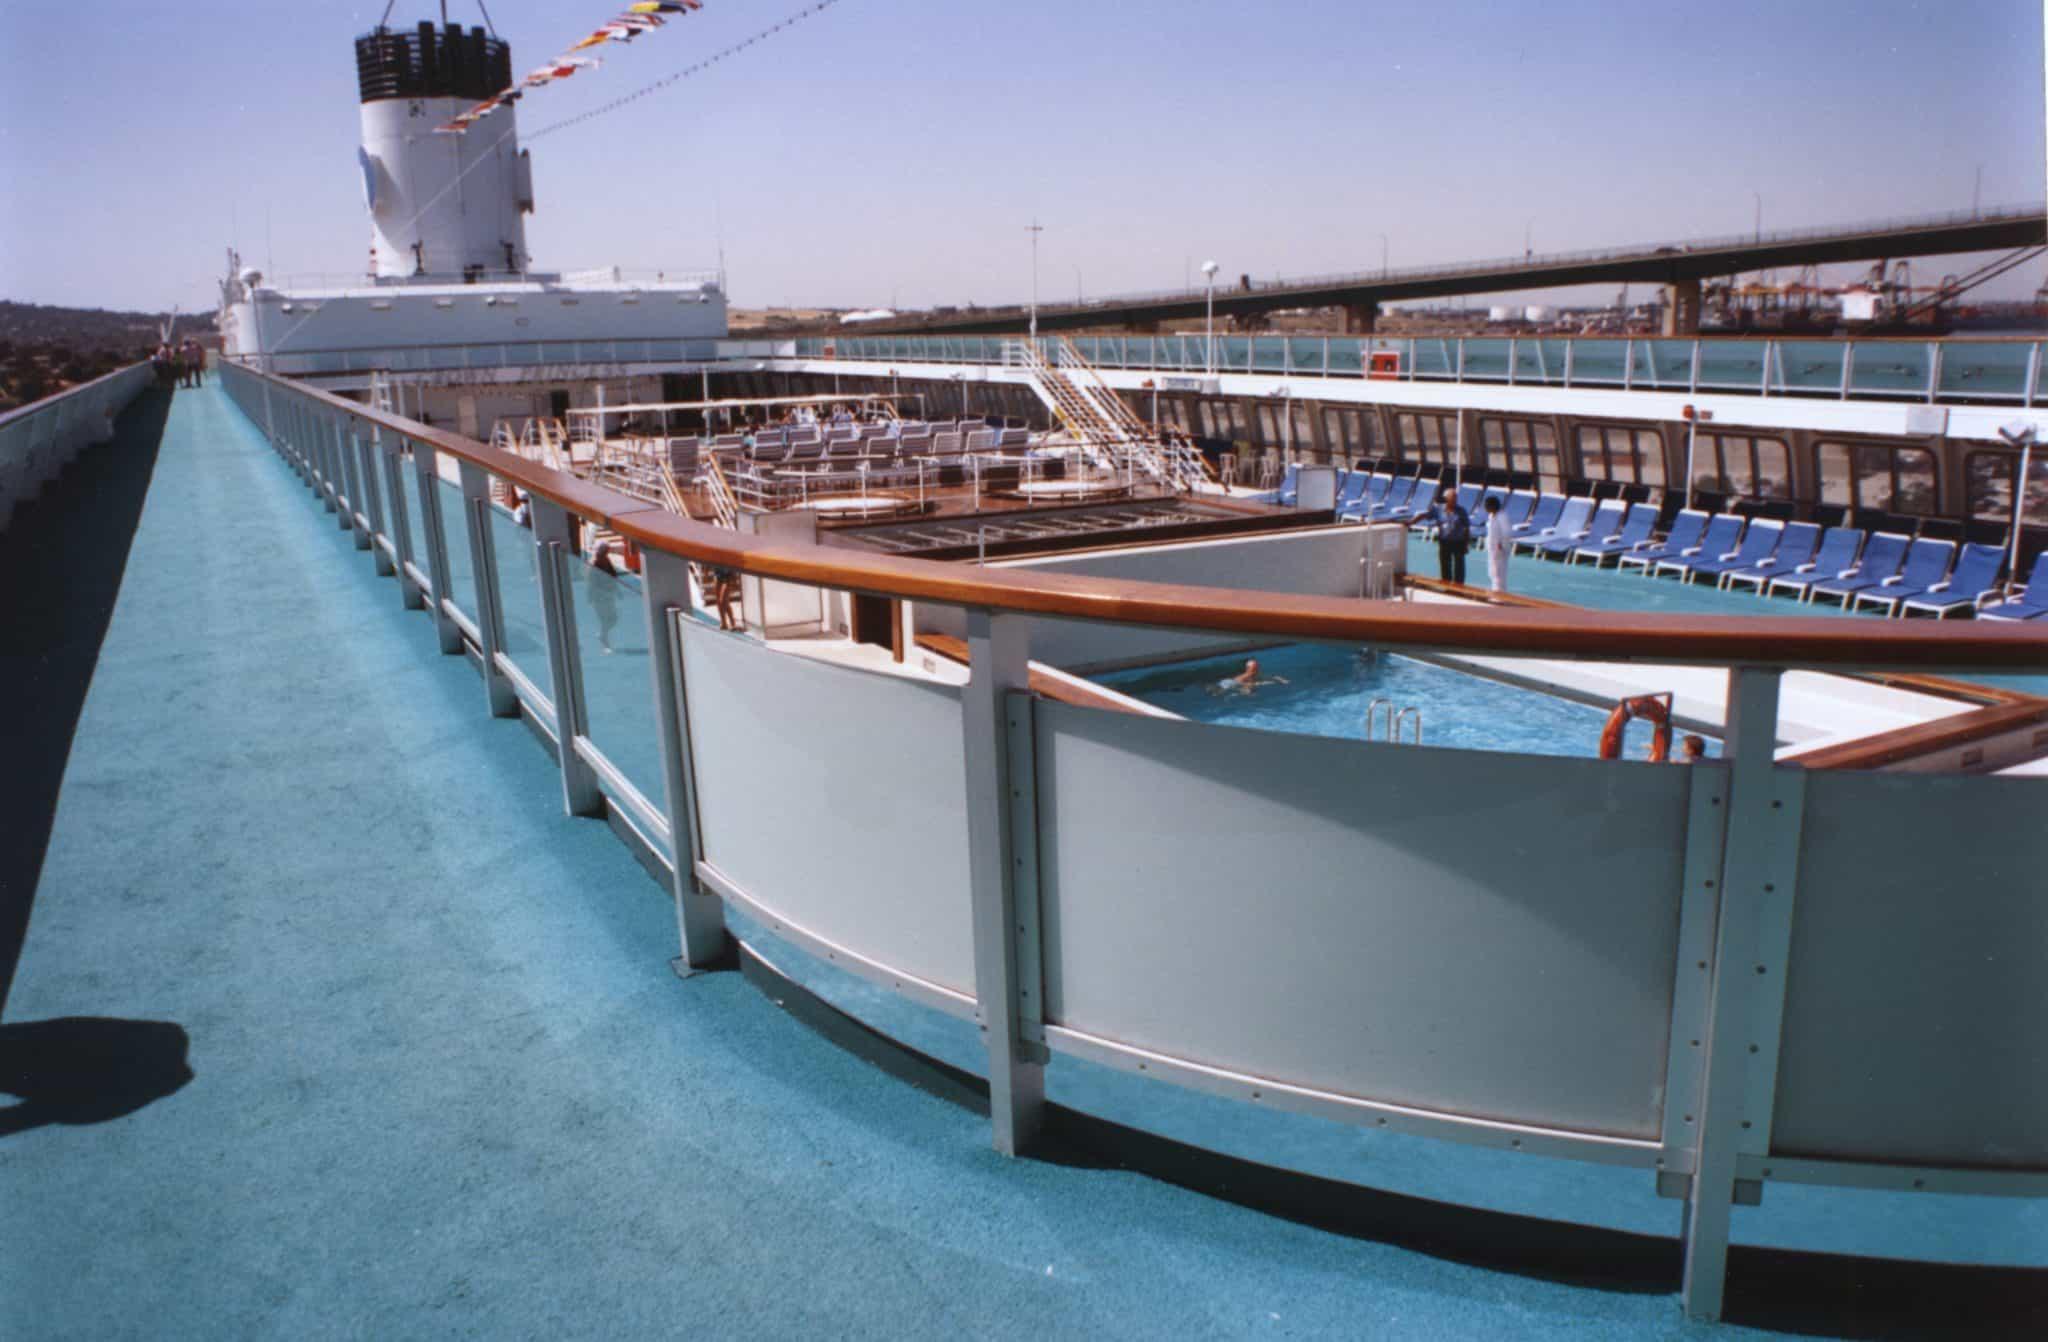 Starboard sun deck promenade, facing aft.